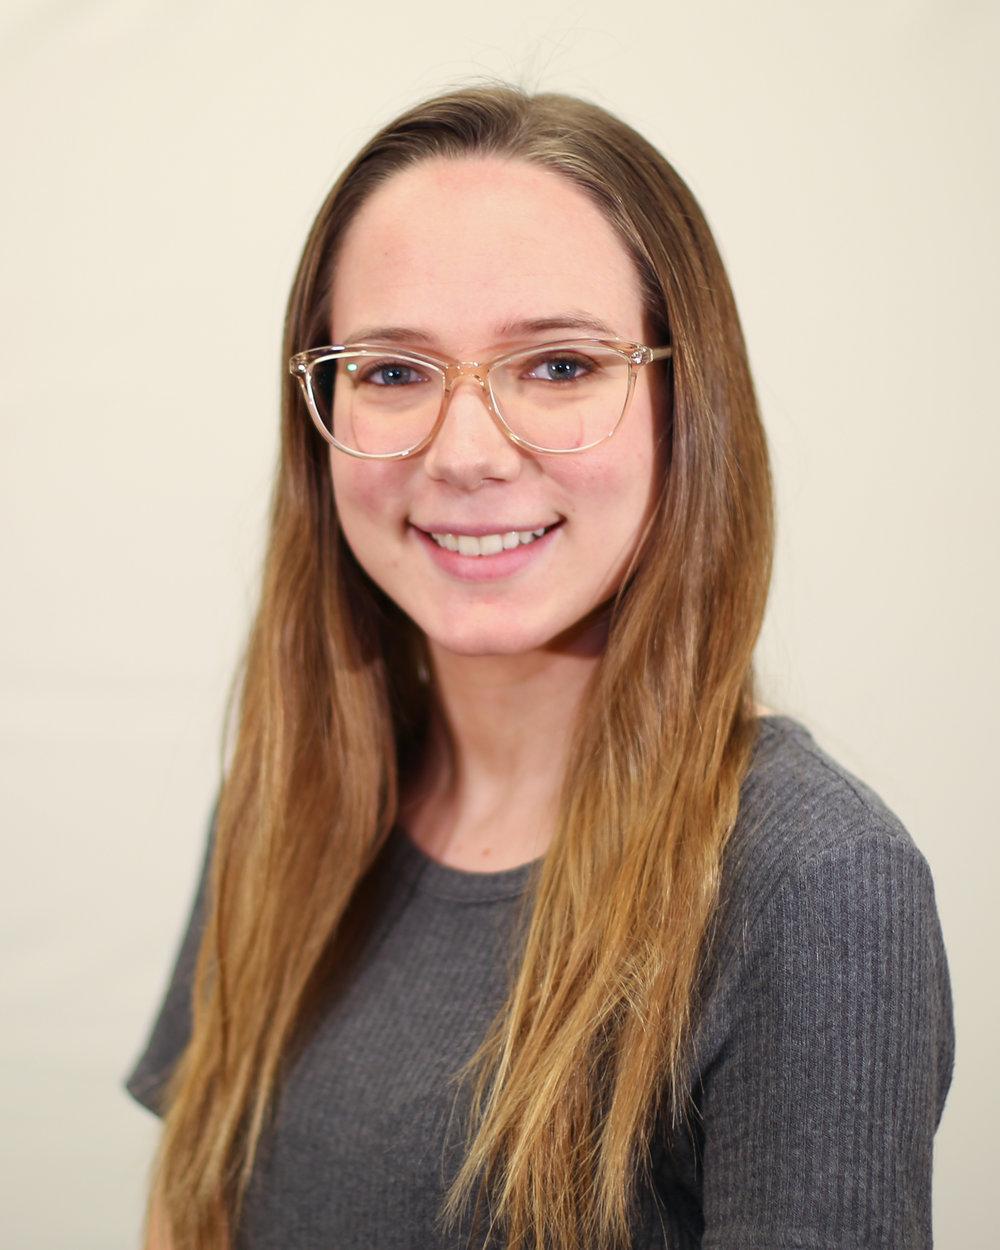 Emily Alonso